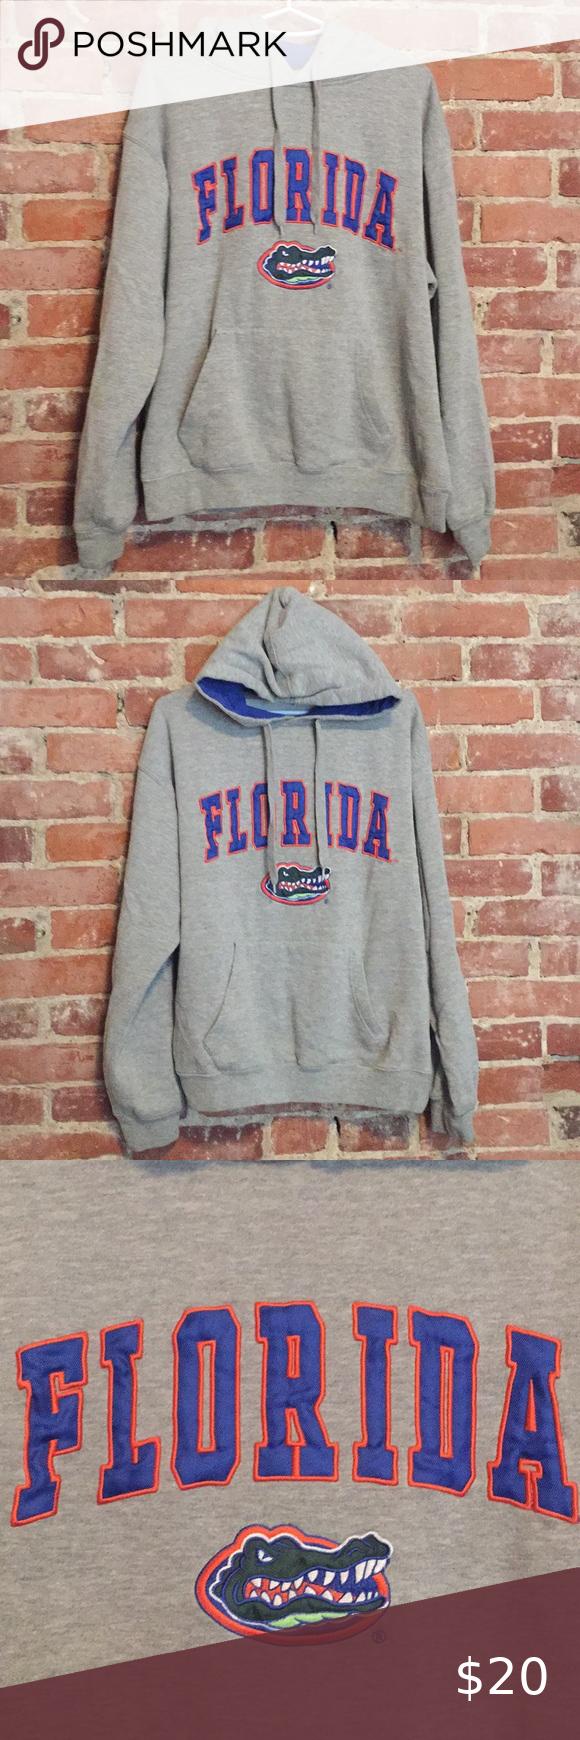 University Of Florida Gators Hoodie Sweatshirt In 2020 Florida Gators Hoodie Sweatshirts Hoodie Sweatshirts